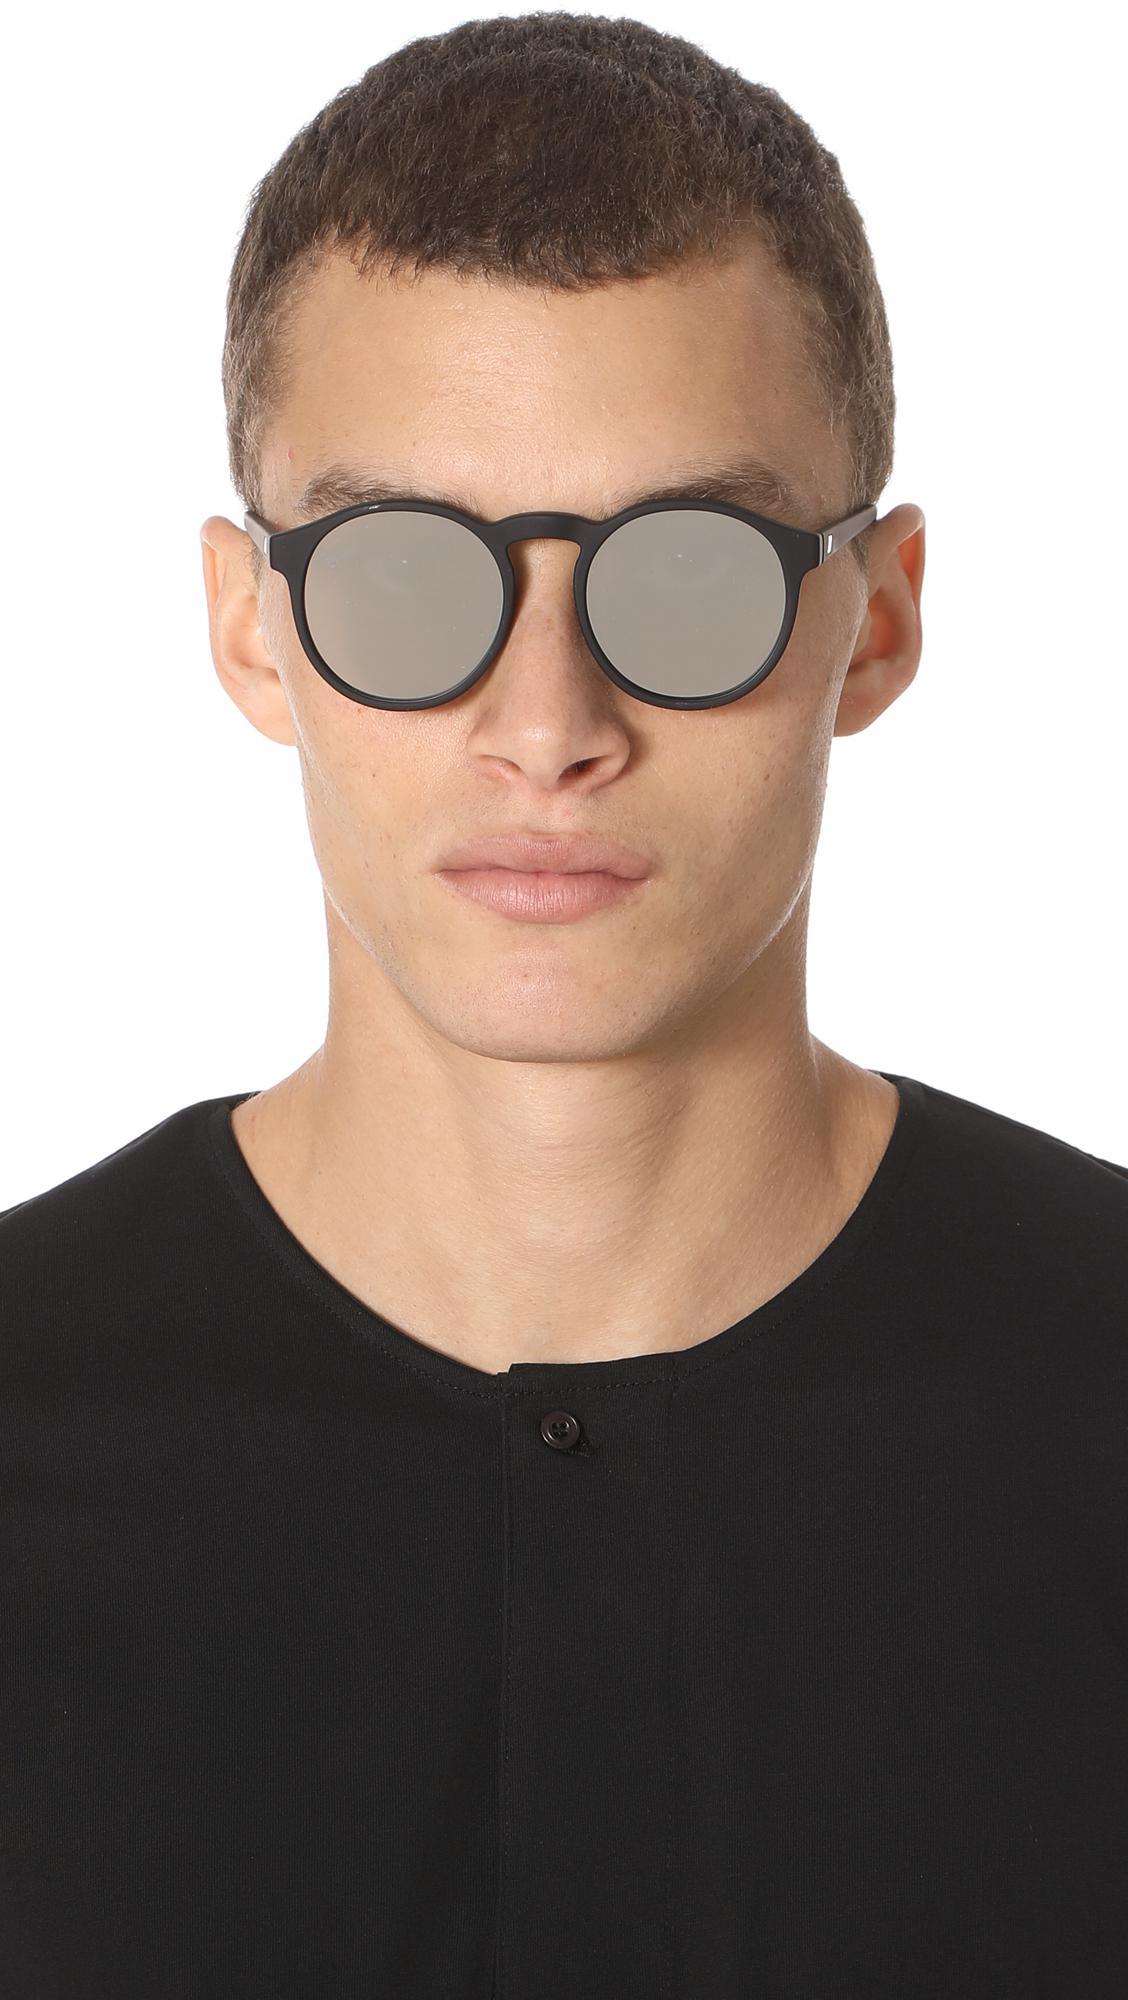 59a4232f165 Le Specs Cubanos Sunglasses in Black for Men - Lyst